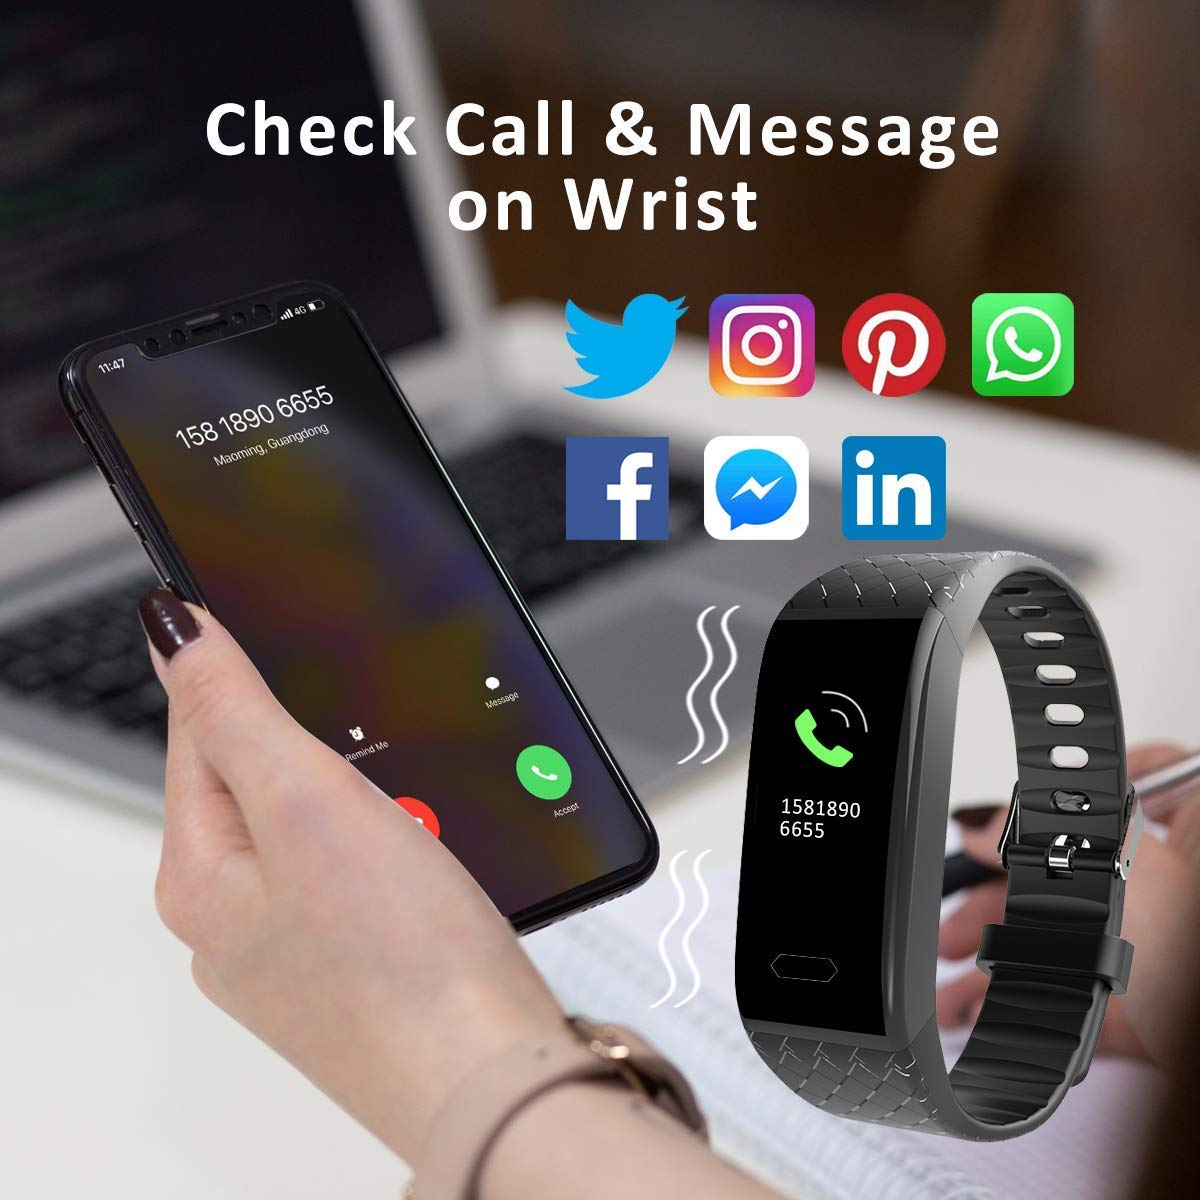 Reloj Inteligente, ISENPENK Smart Watch Pulsera Pantalla táctil Hombres Mujeres Niños,Pulsómetro, Monitor de Ritmo Cardíaco, Contadores de Calorías, ...